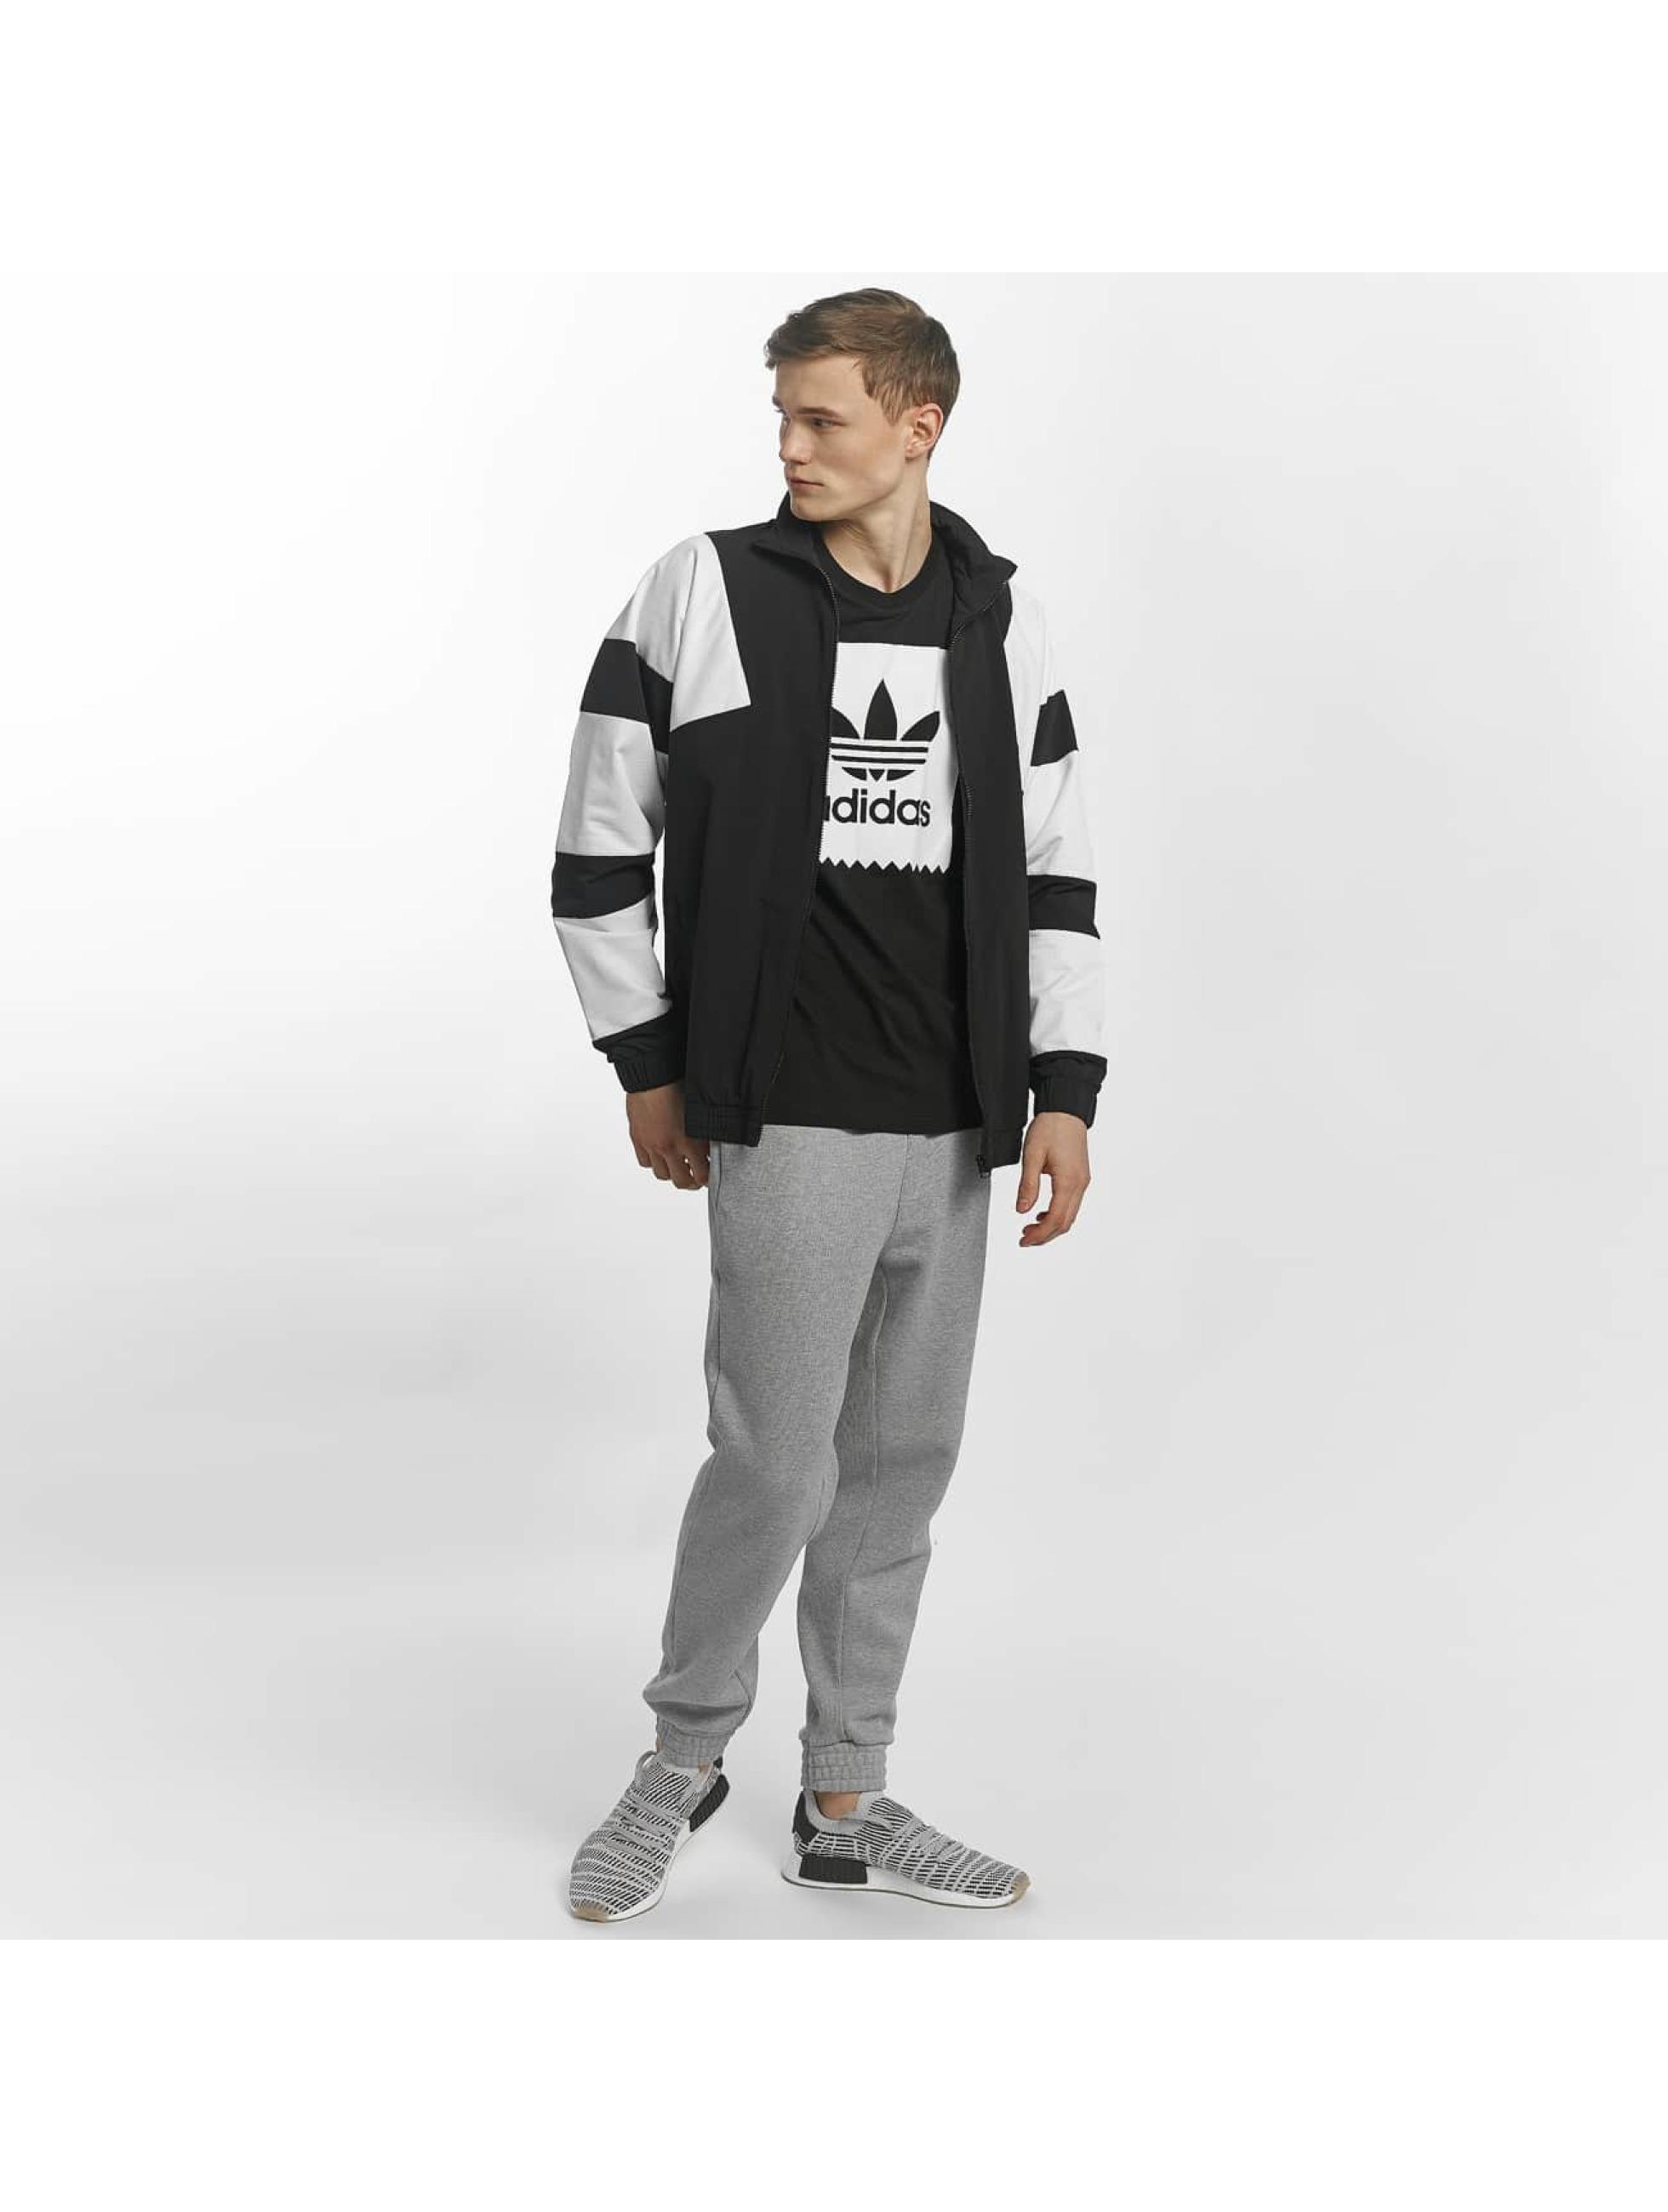 adidas Välikausitakit Equipment Bold TT 2.0 musta a6cd4777fa